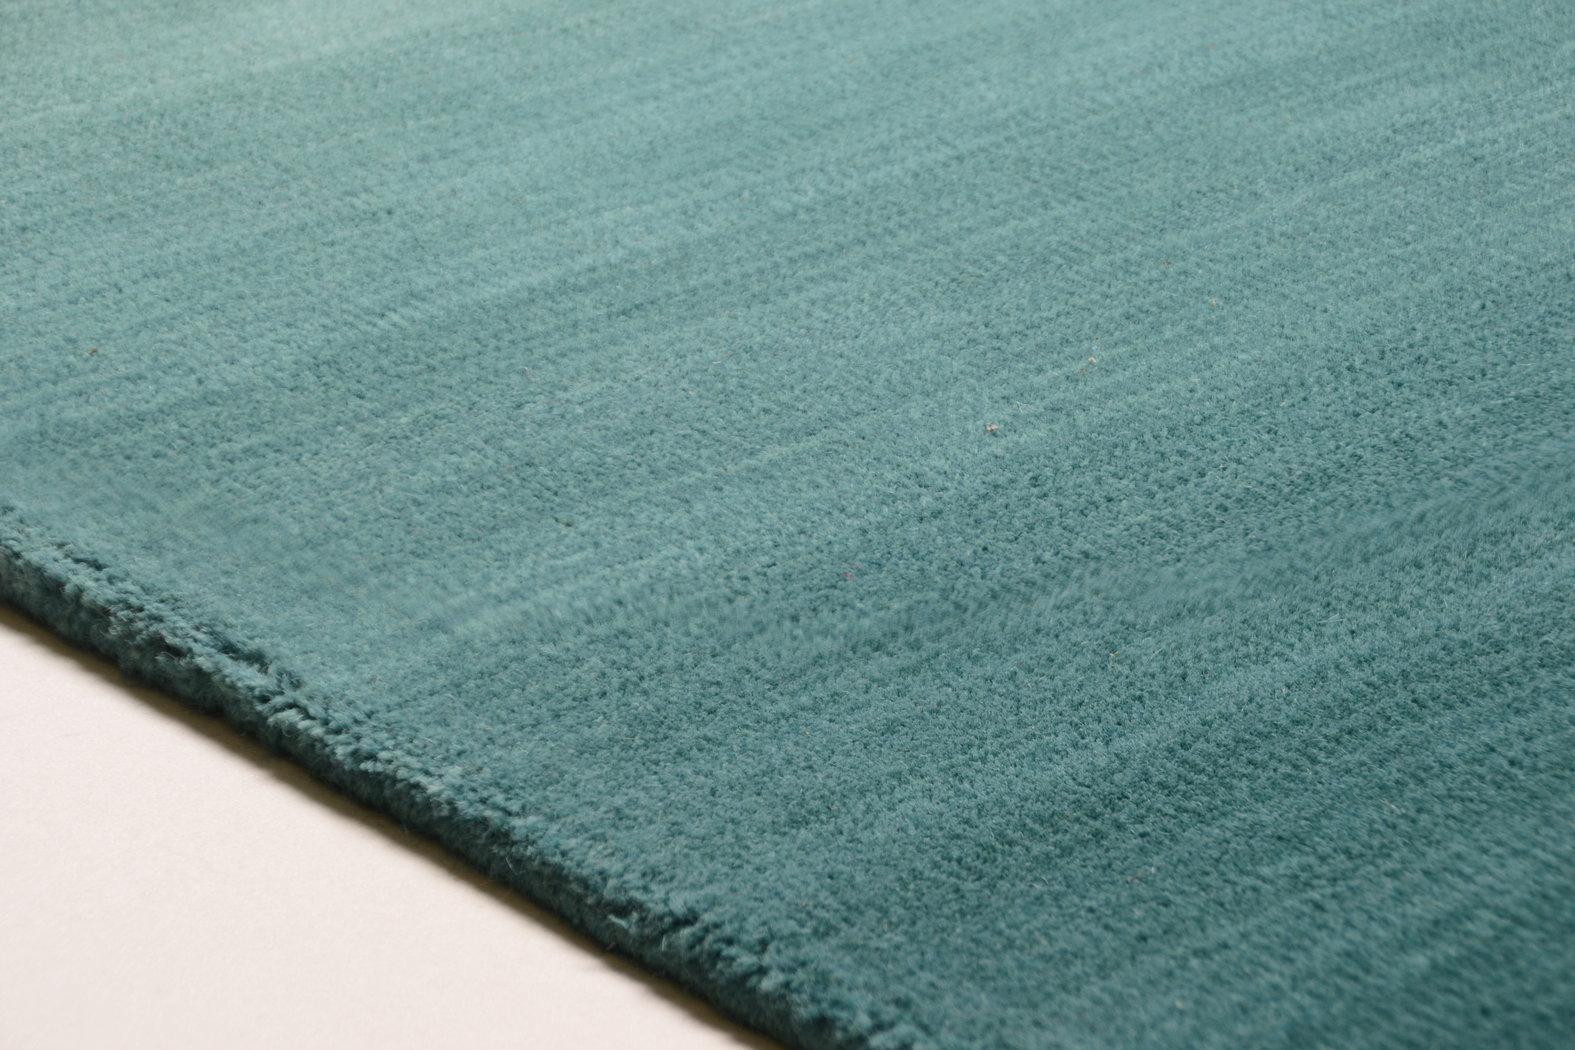 Tappeto Moderno Turchese : Tappeto moderno turchese u tappeto sona lux